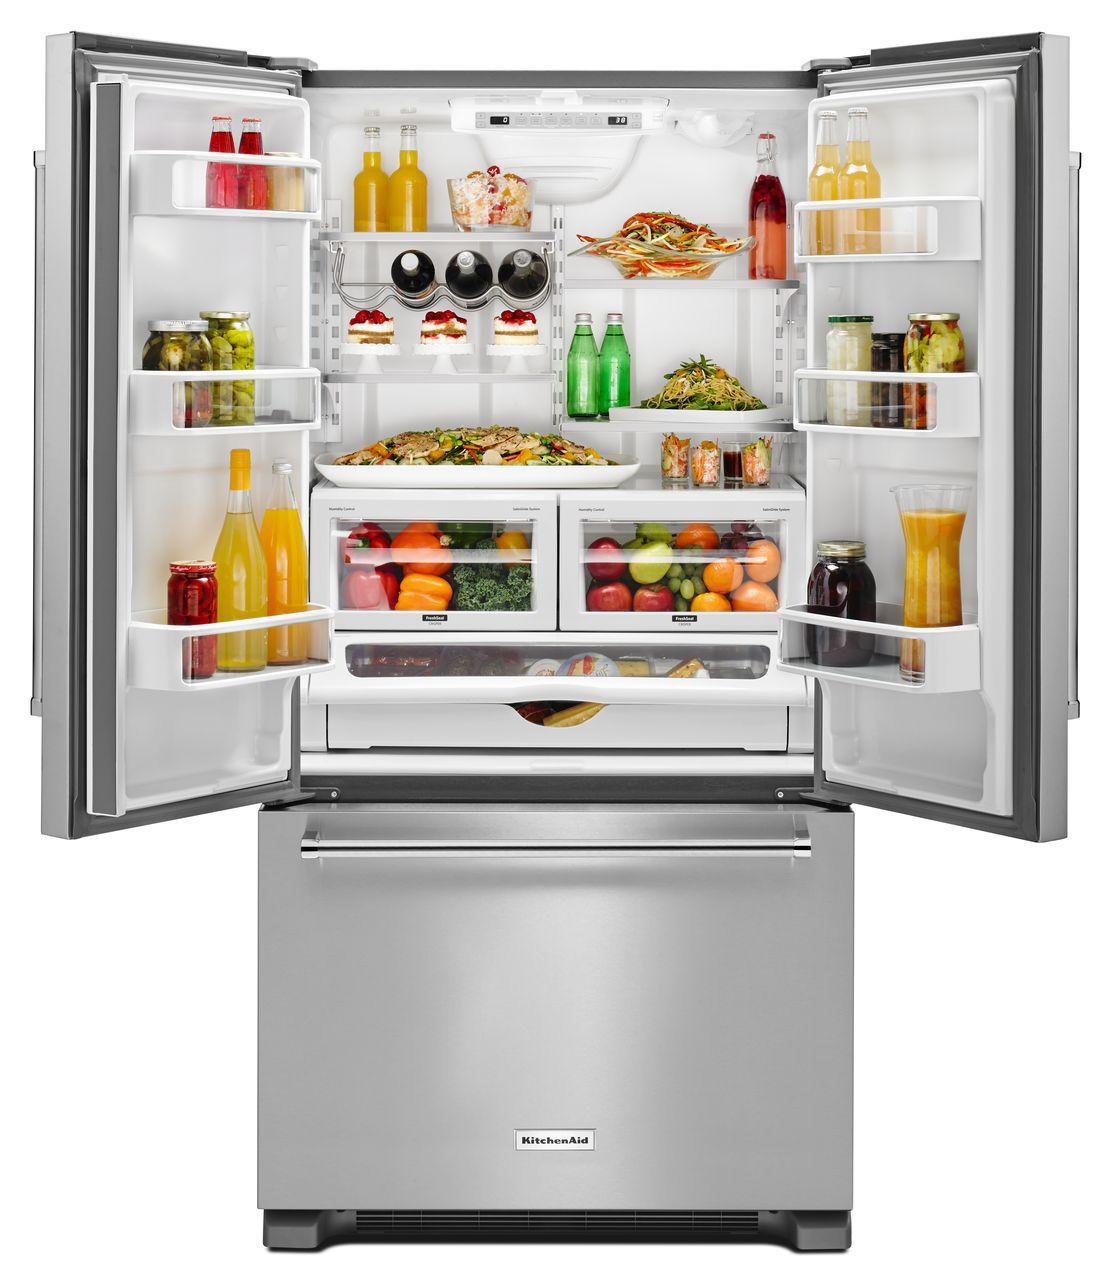 Kitchenaid stainless french door refrigerator krfc302ess main image 1 2 rubansaba